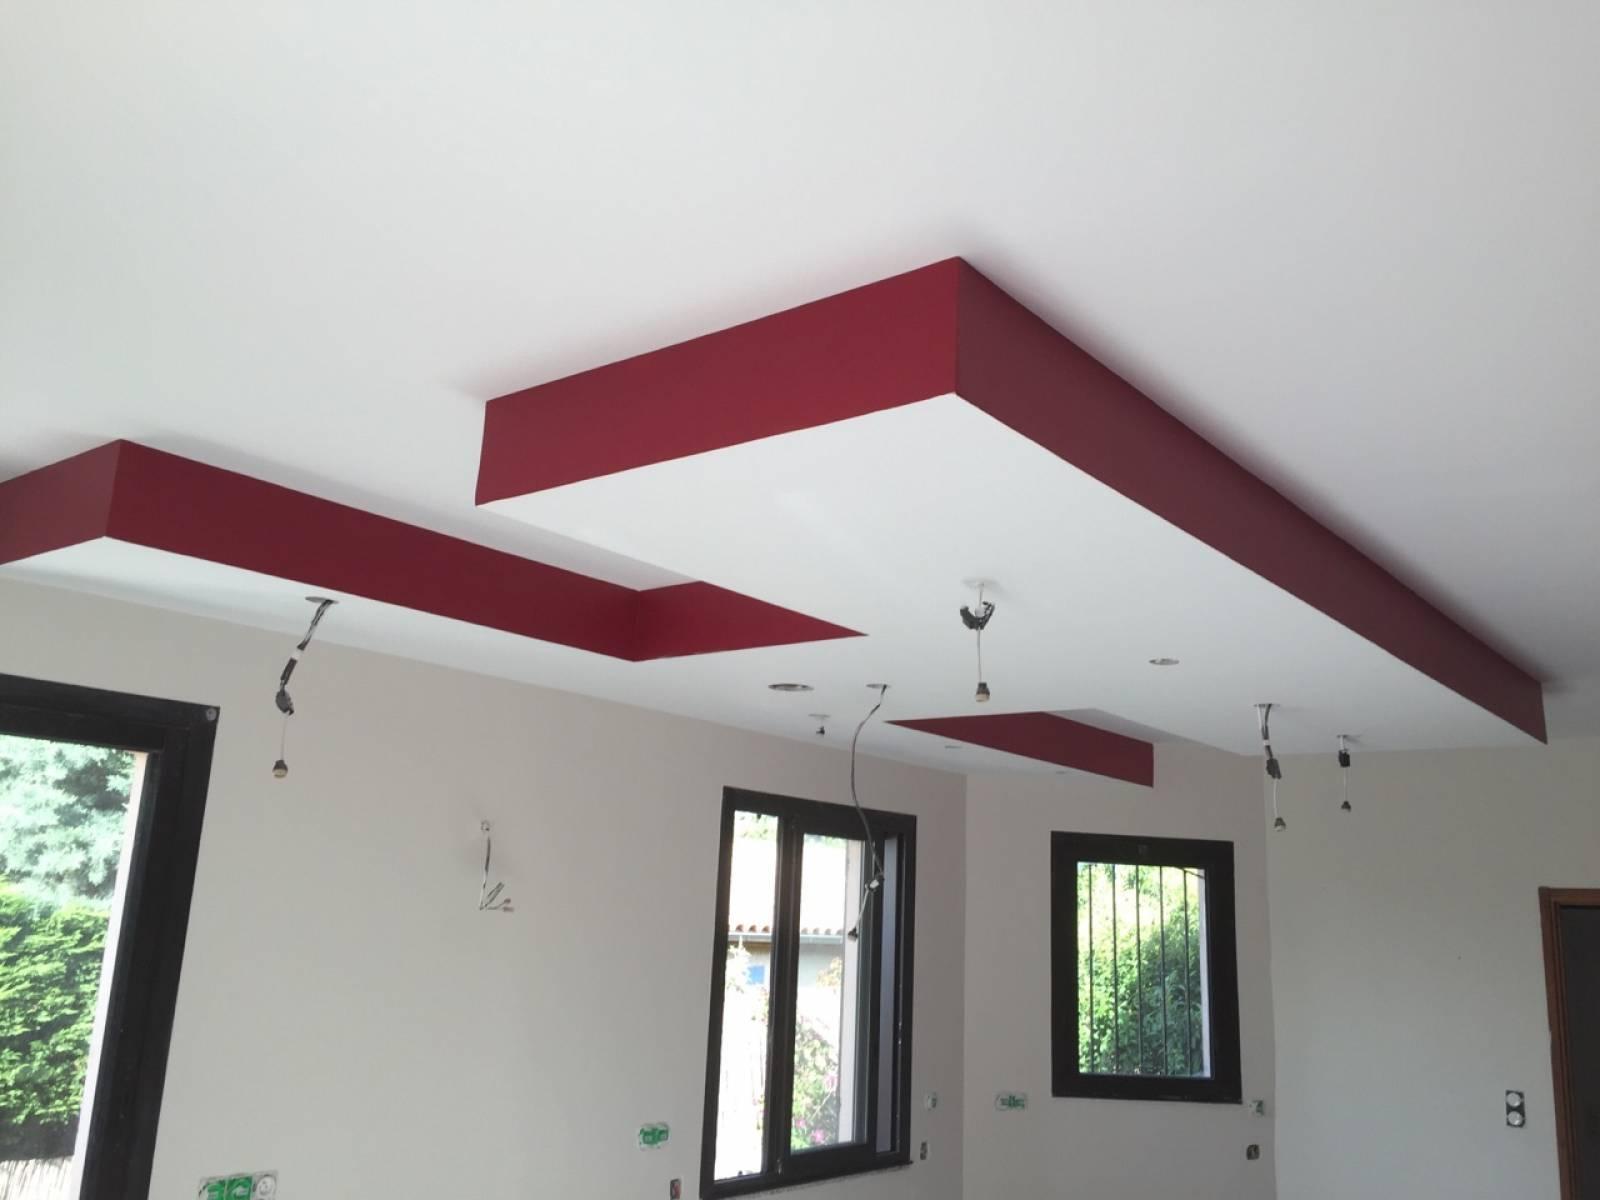 Fabrication Coffrage Plafond Decaisse Lumineux Avec Spots A Led